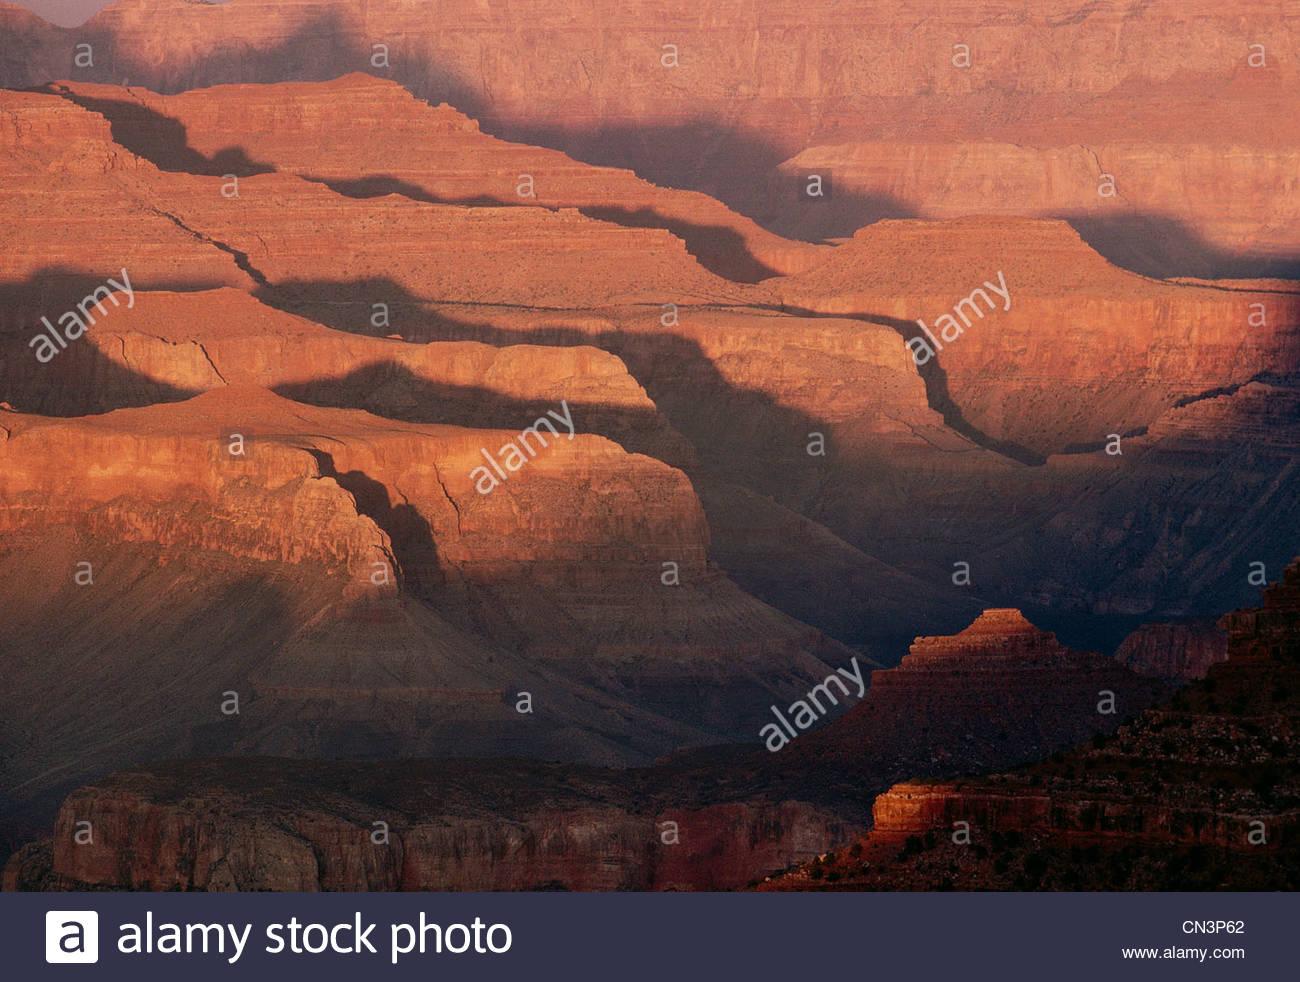 Grand Canyon National Park, Arizona - Stock Image